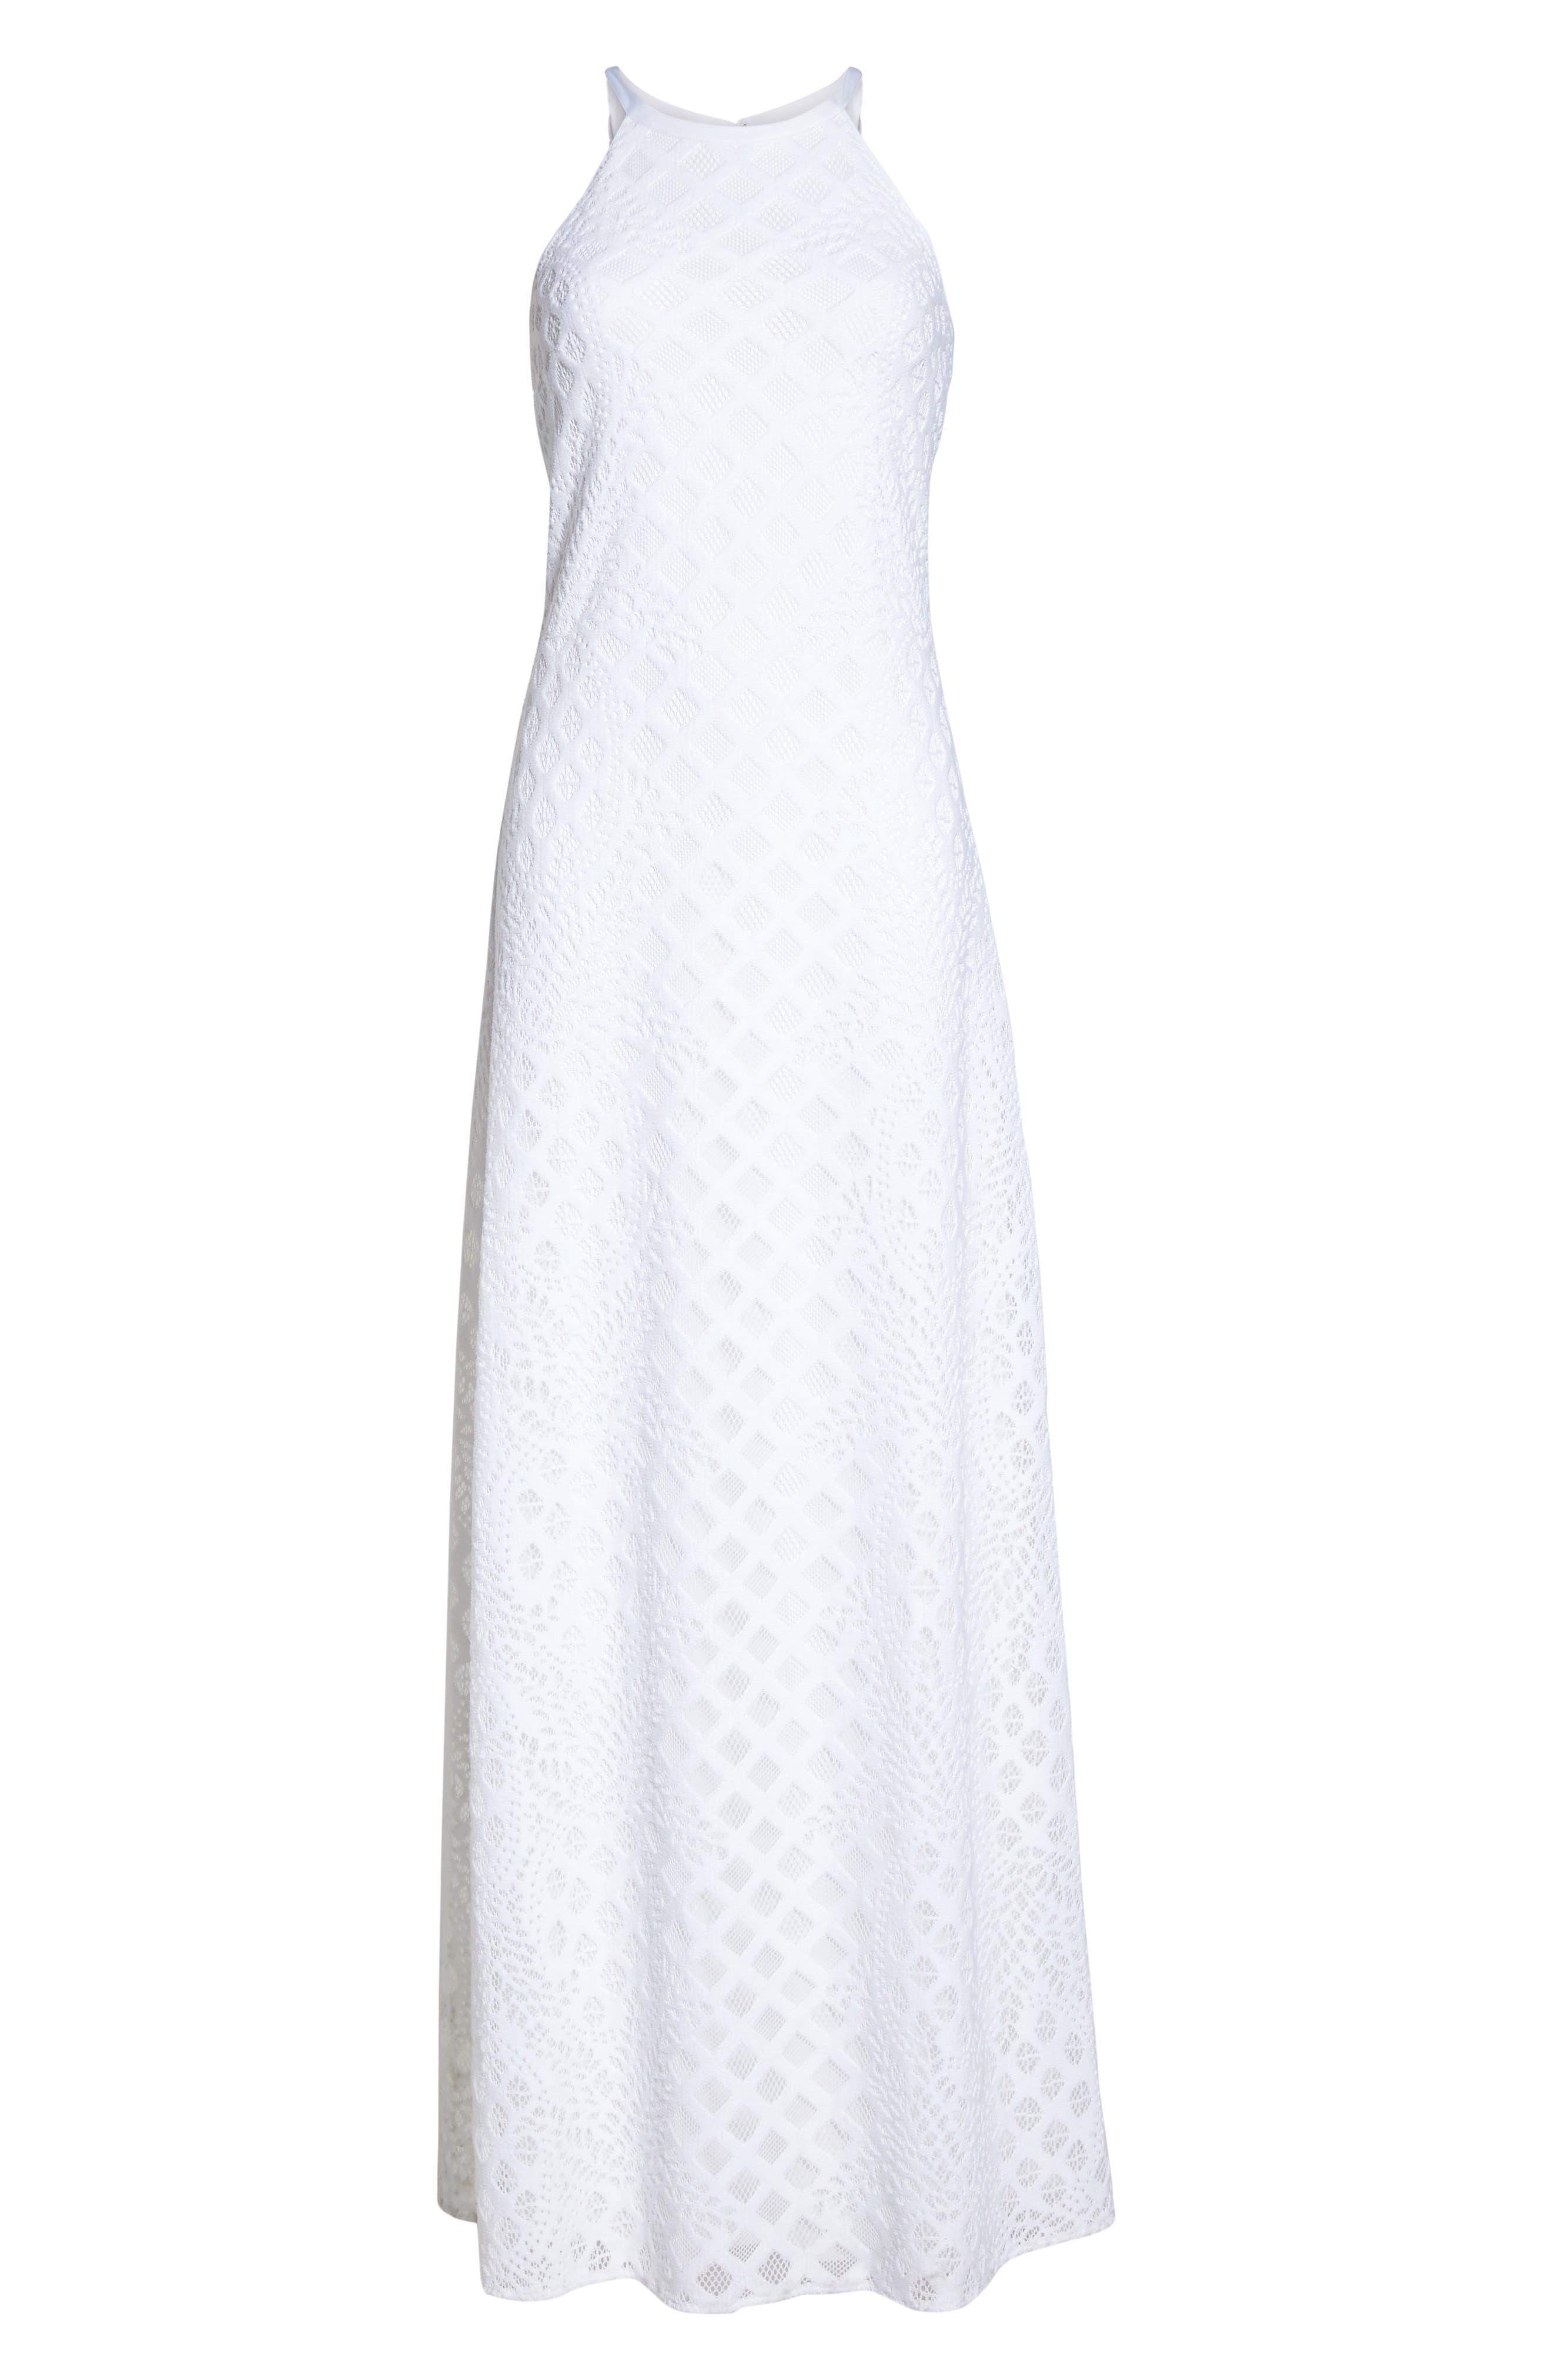 Pearl Maxi Dress,                             Alternate thumbnail 6, color,                             Resort White Pineapple Lace